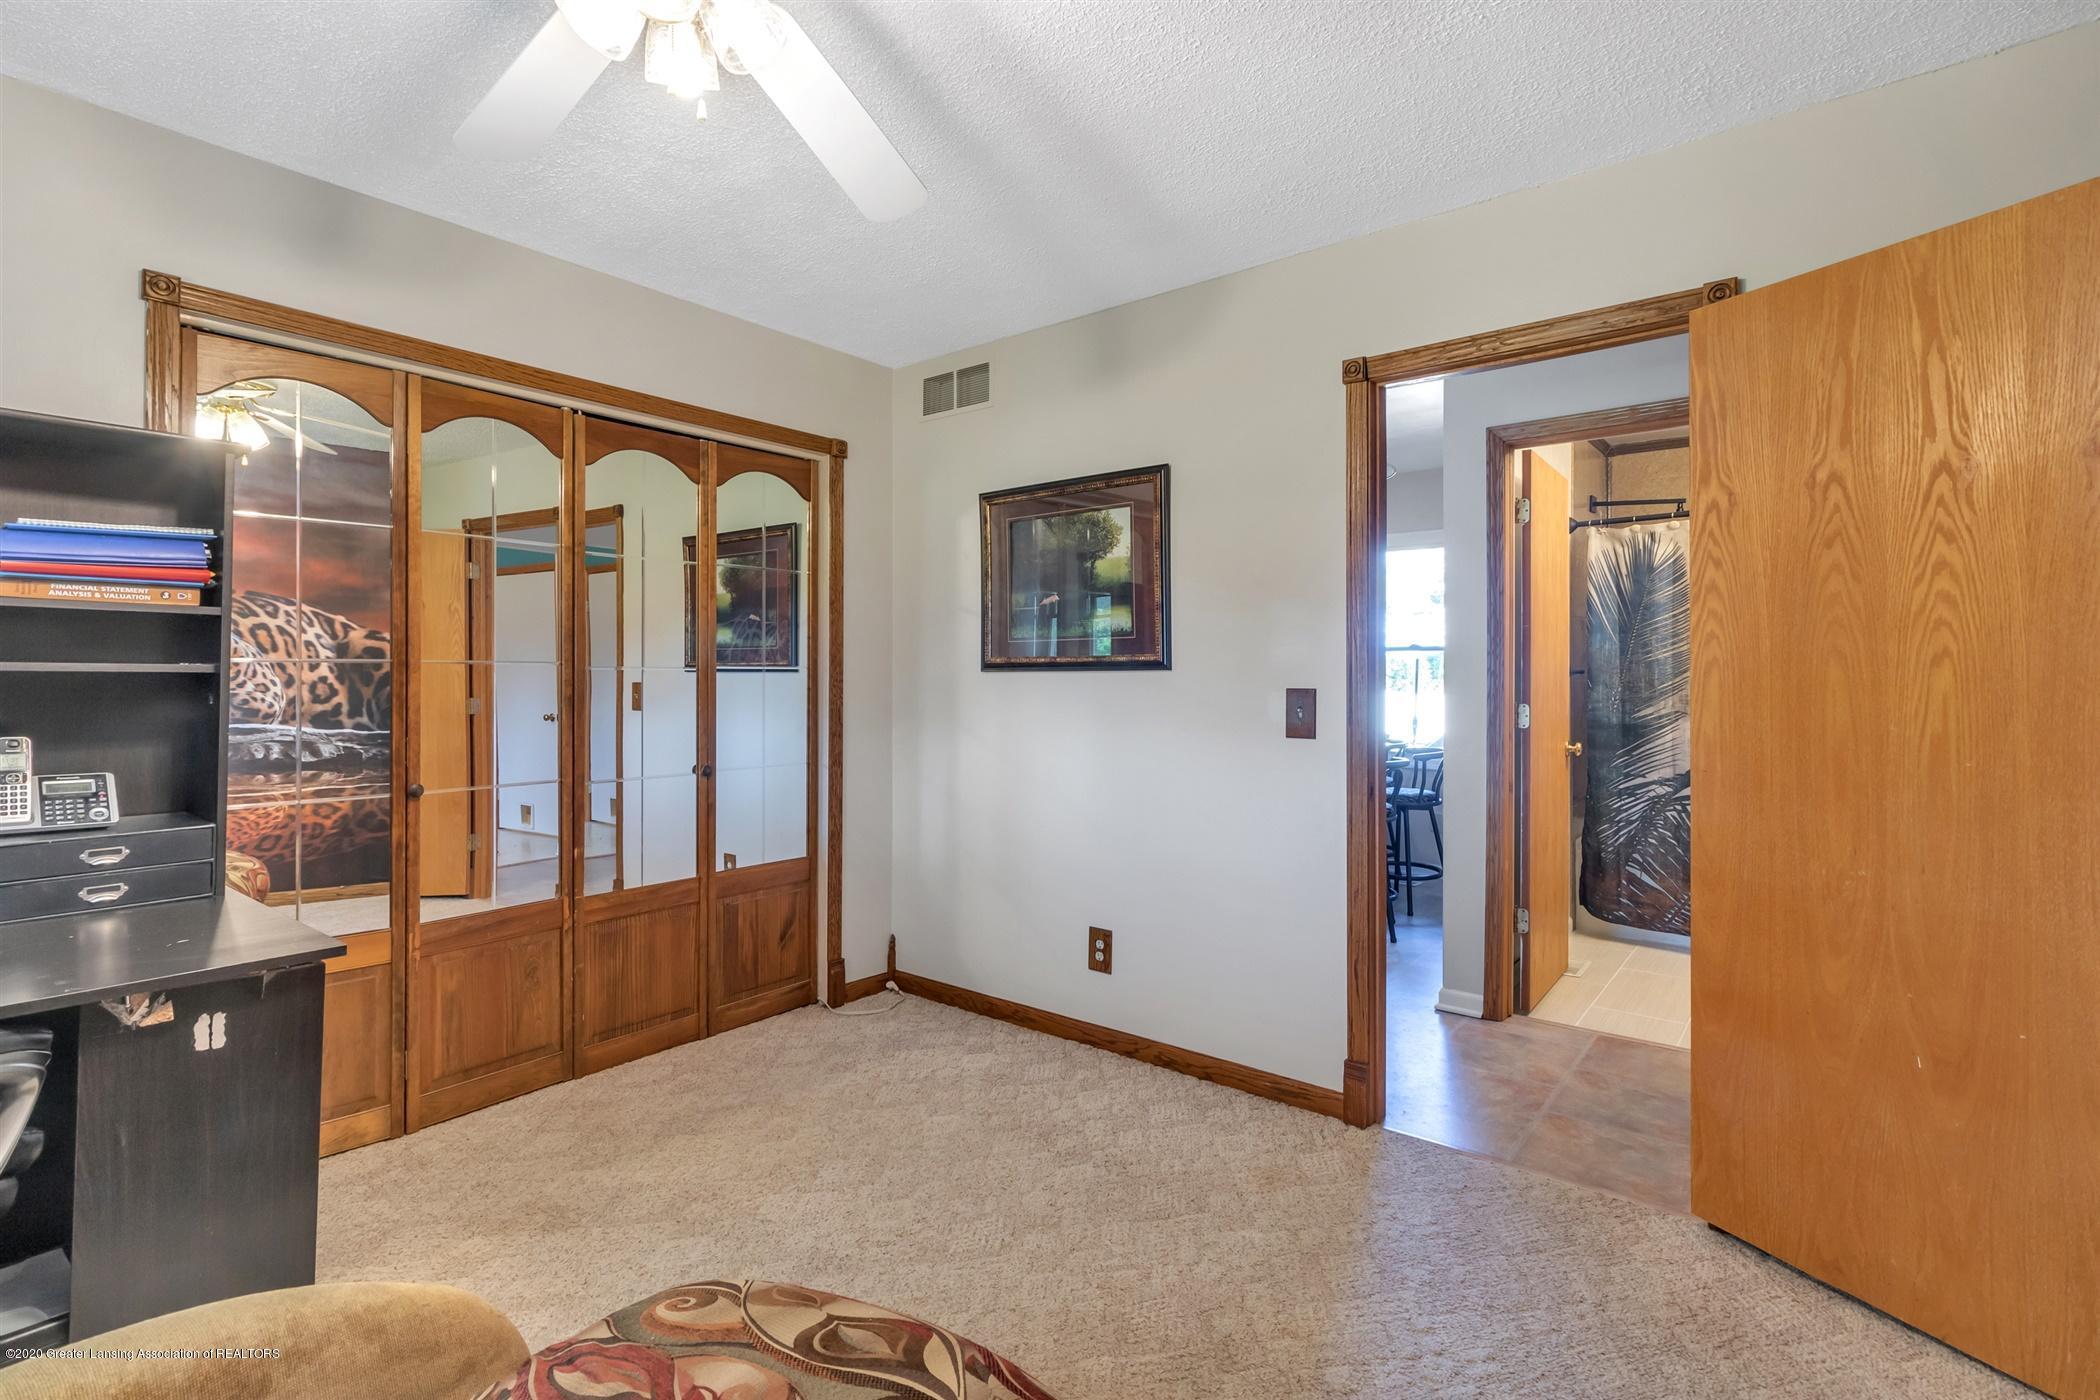 7346 W Cutler Rd - 11-7346 W Cutler Rd-WindowStill-Rea - 14